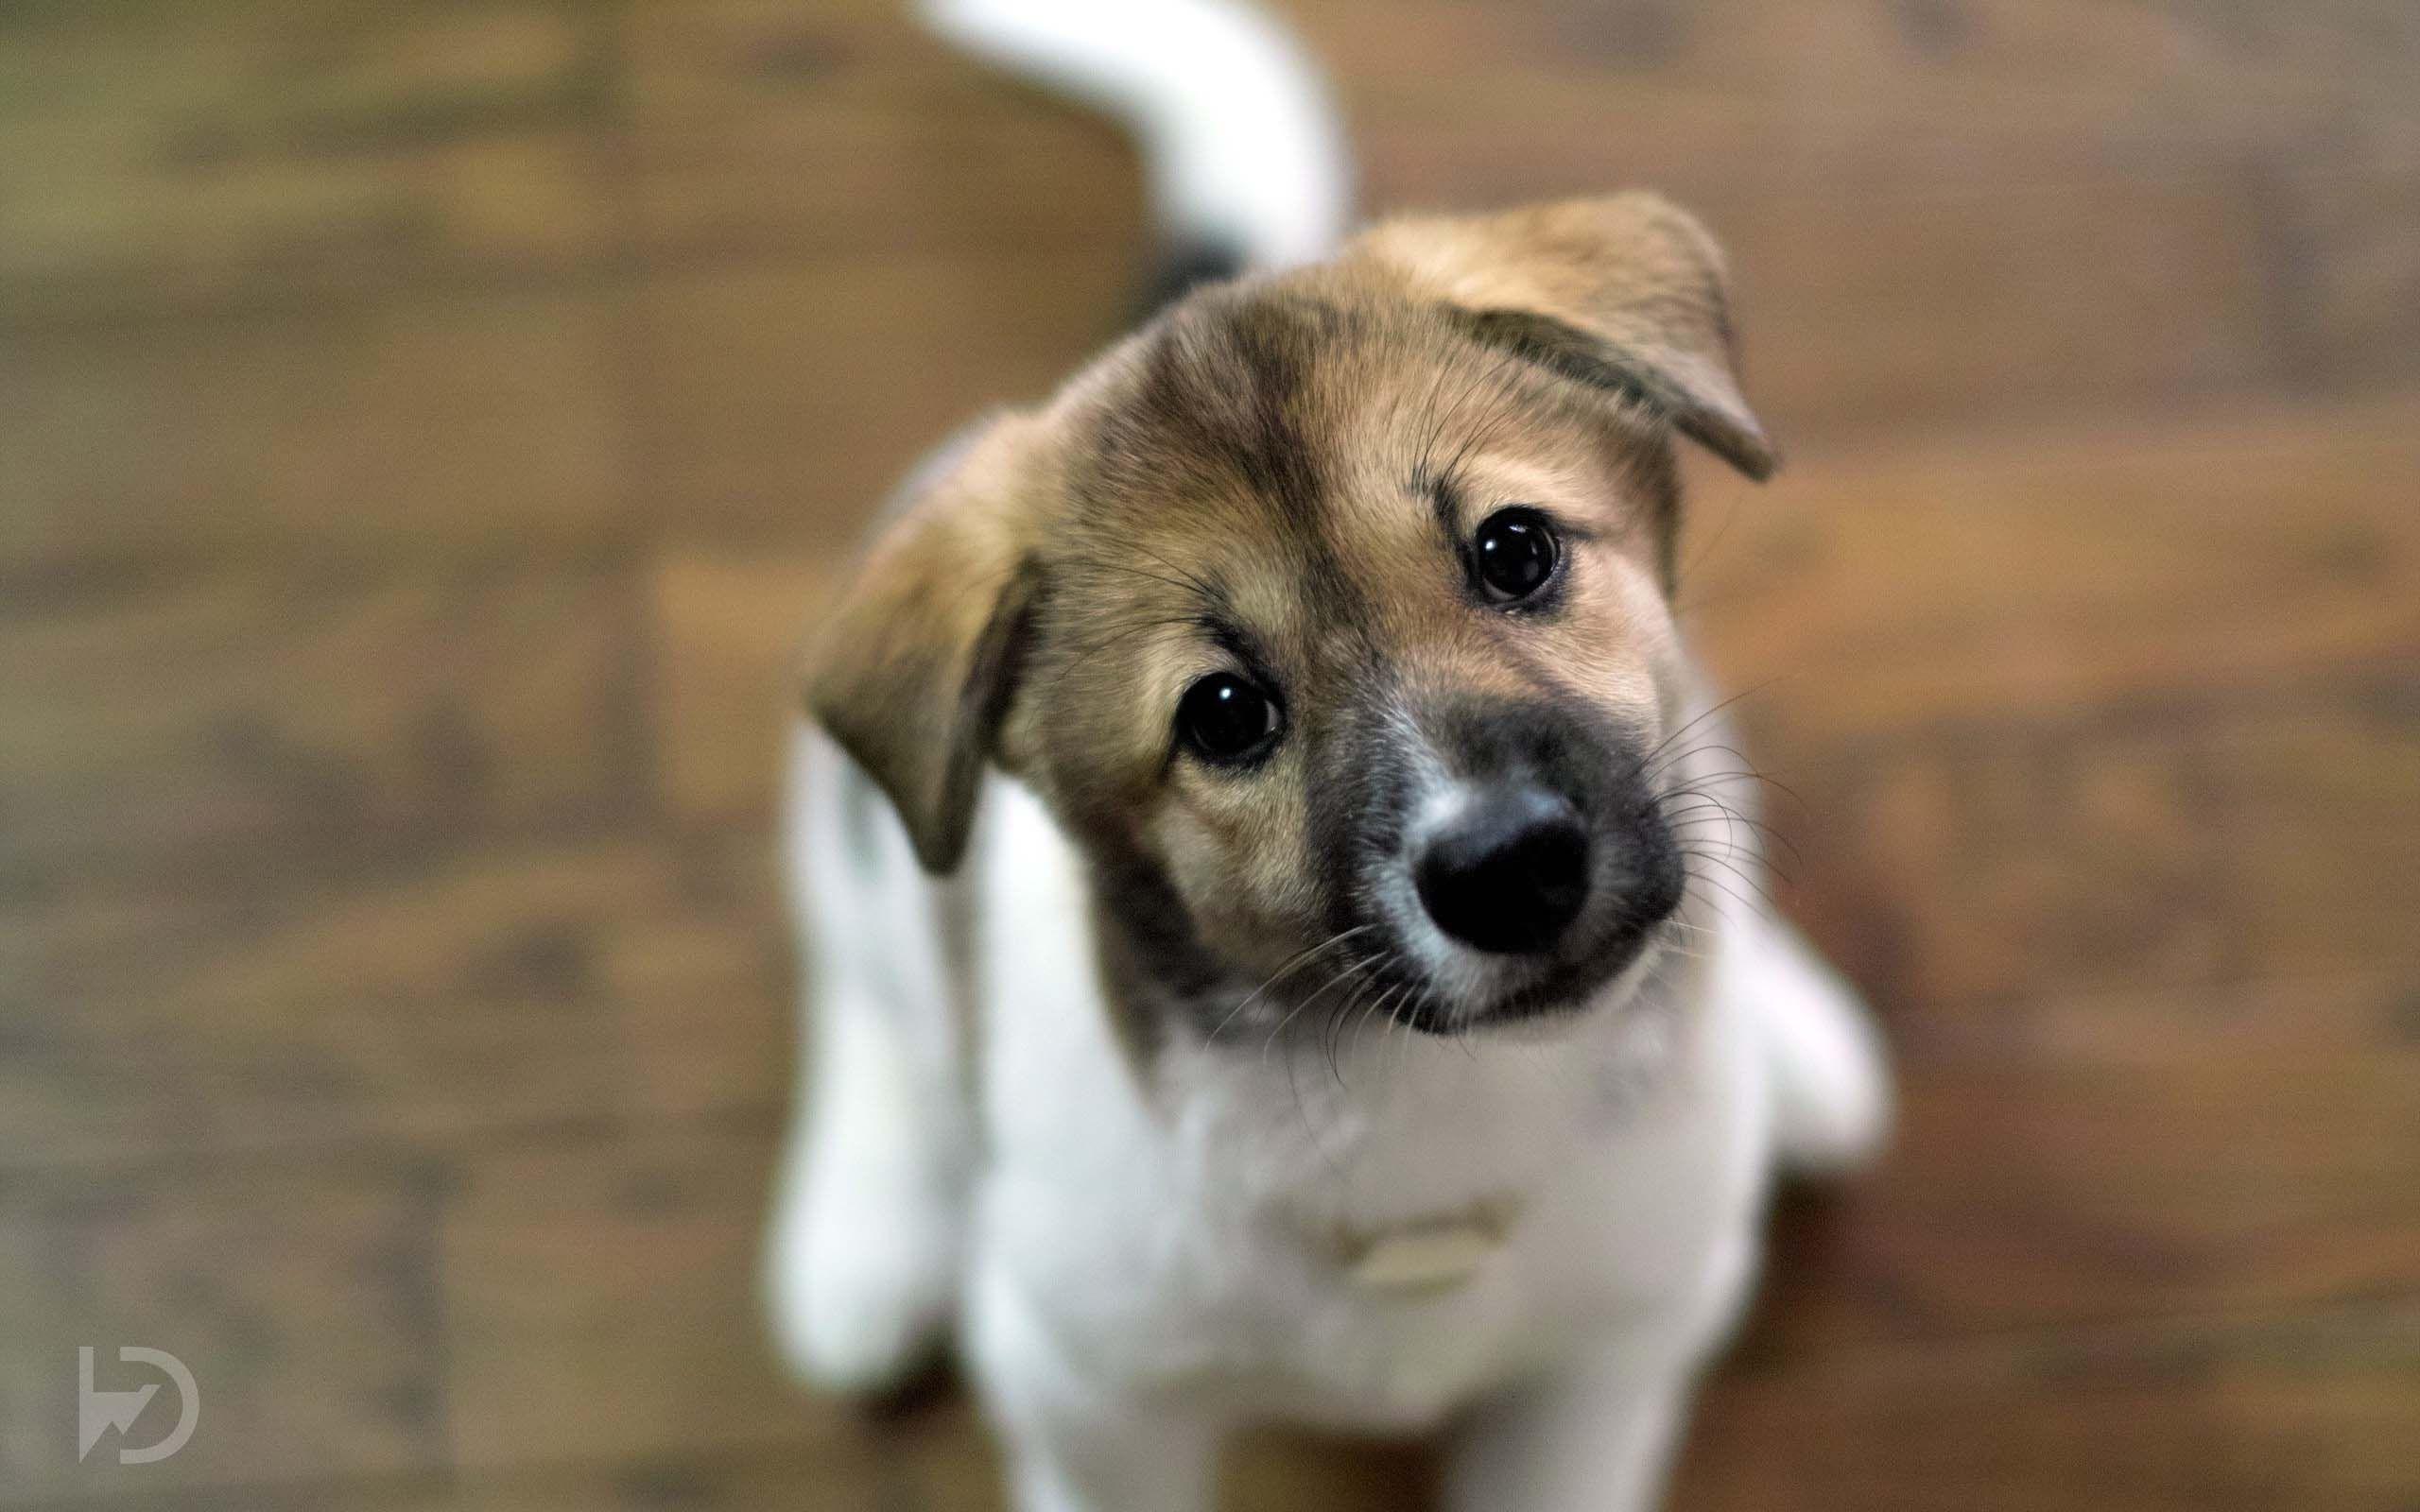 cute dogs wallpapers | download wallpaper | pinterest | dog